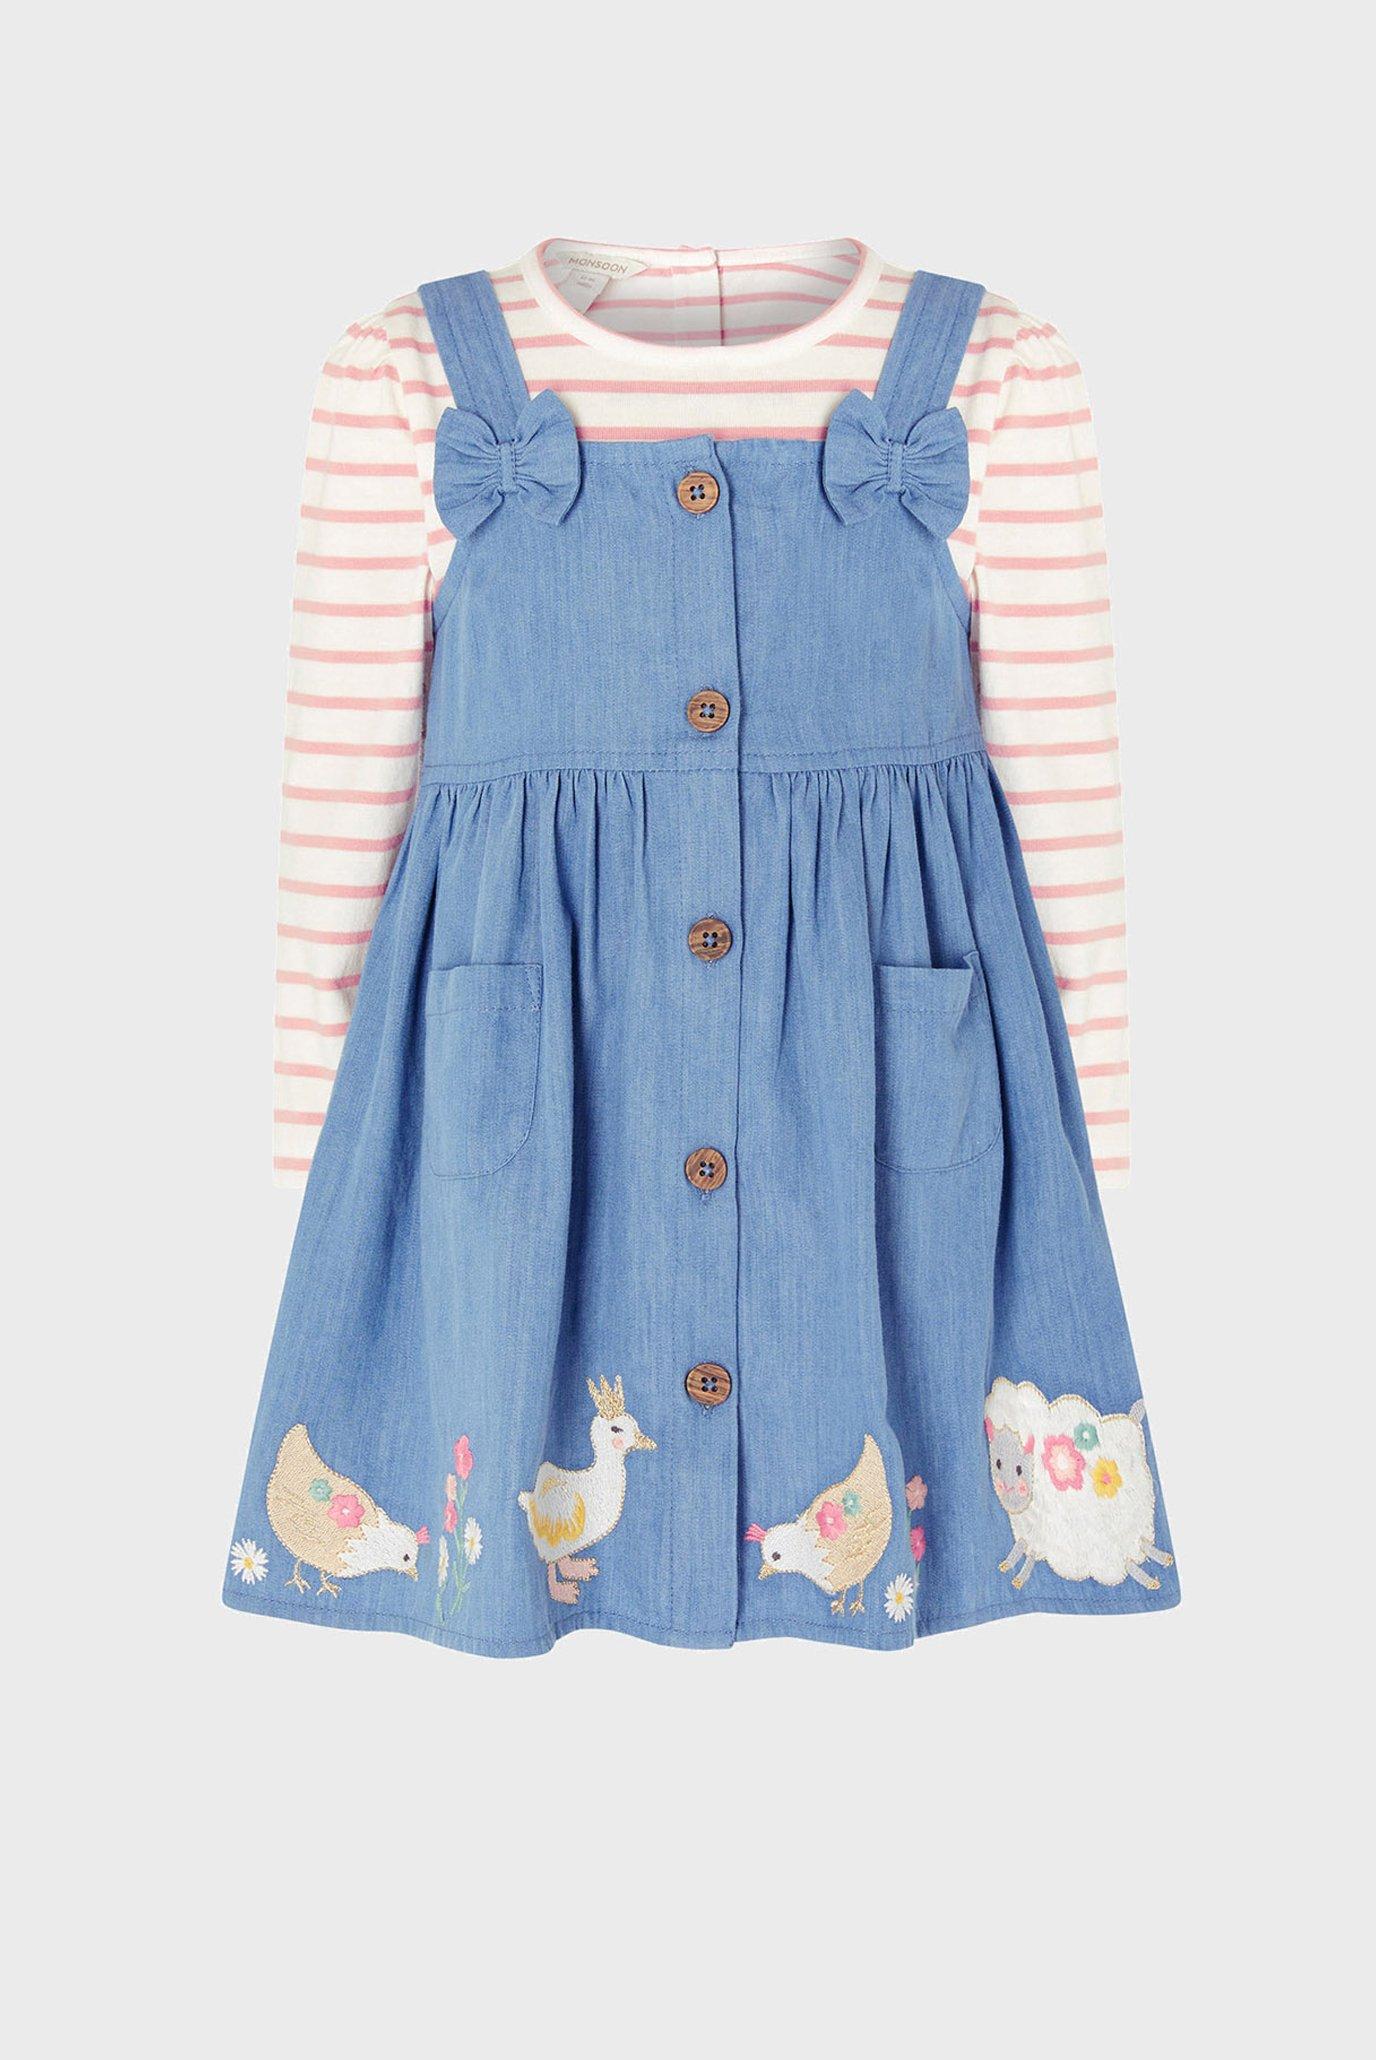 Дитячий комплект одягу (джемпер, сарафан) BABY DUCK DENIM PINN 1